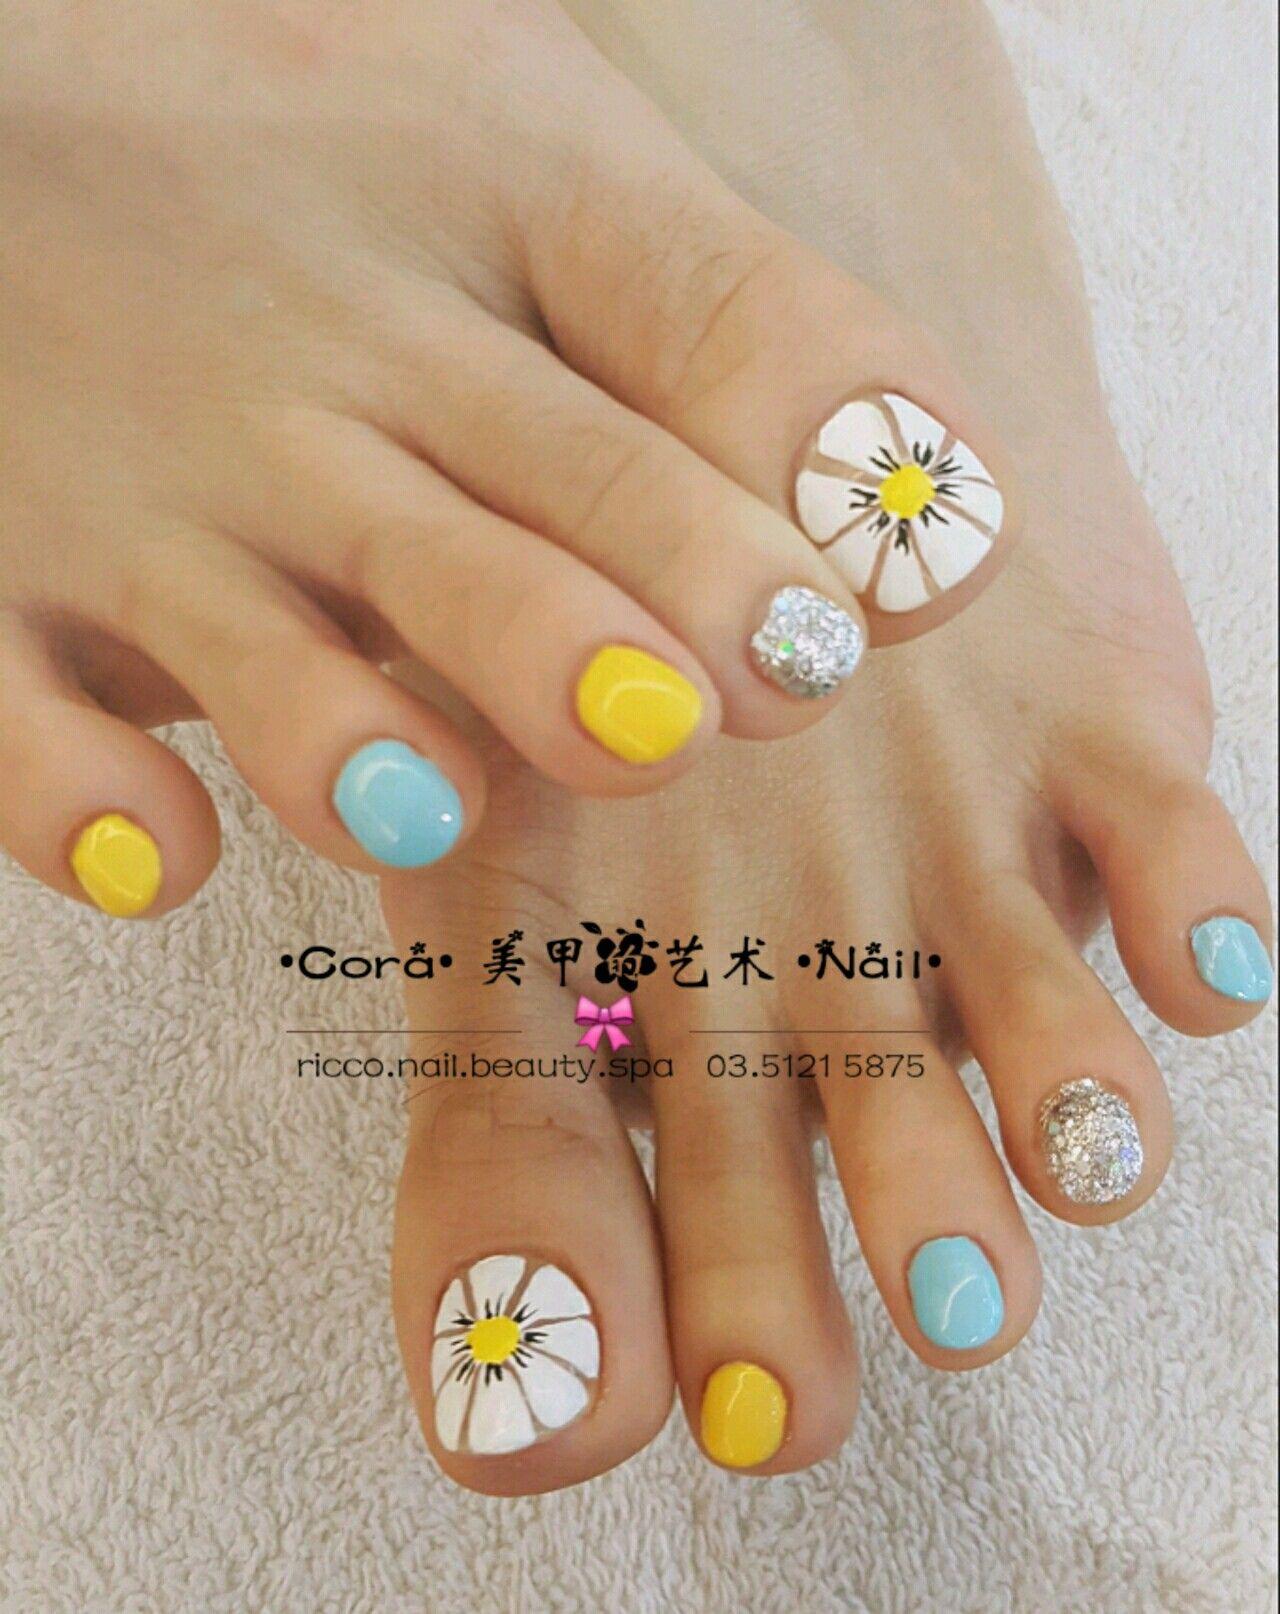 Pin by rosibel flores on diseños de uñas in pinterest nails